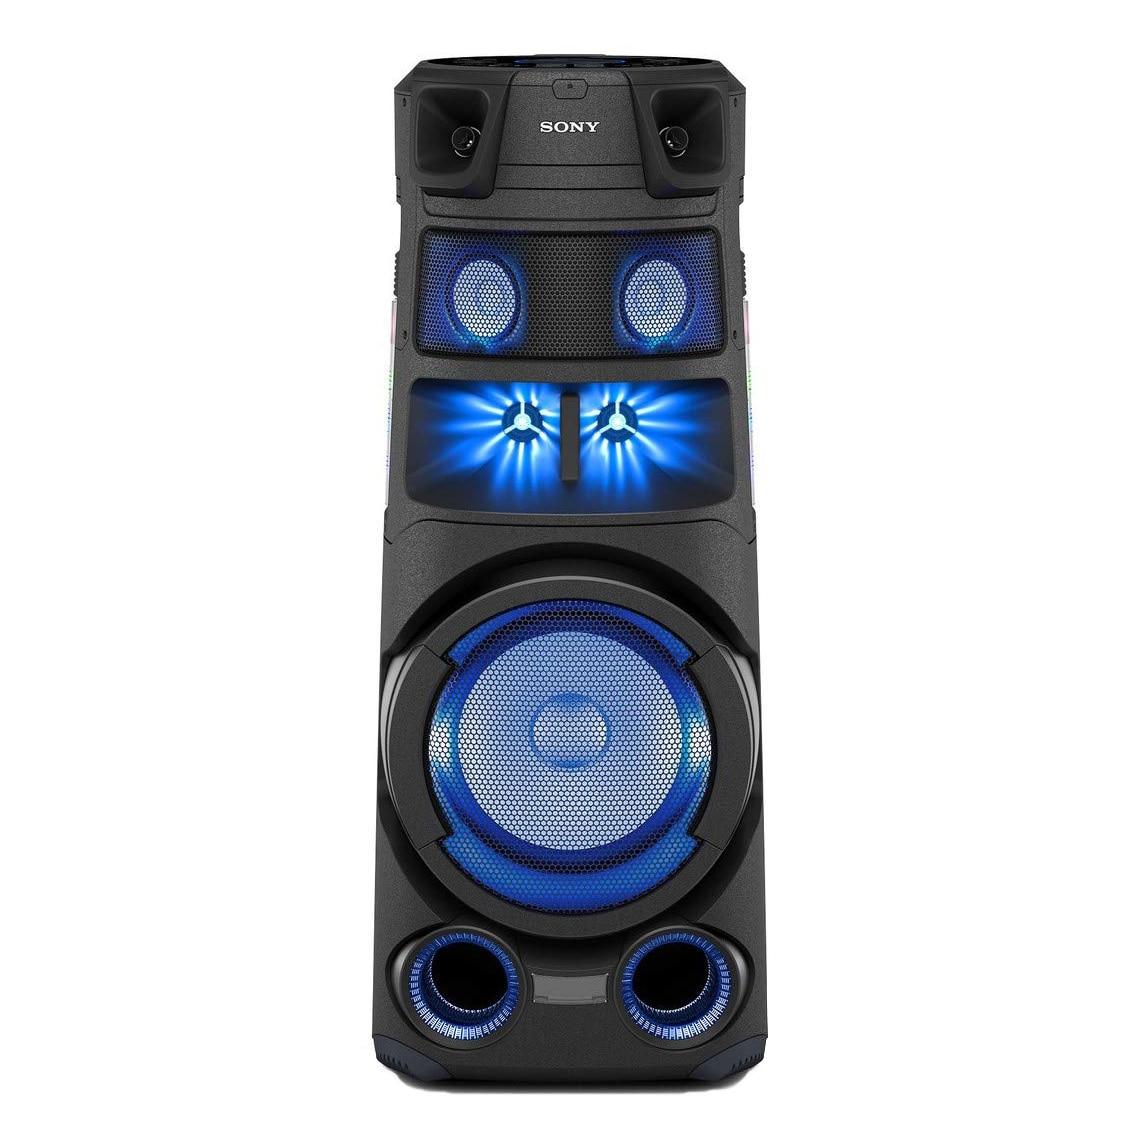 Fotografie Sistem audio High Power SONY MHC-V83D, Hi-Fi, Jet Bass Booster, Party music, Party lights, Dj Effects, Bluetooth, NFC, LDAC, USB, DVD, HDMI, Negru